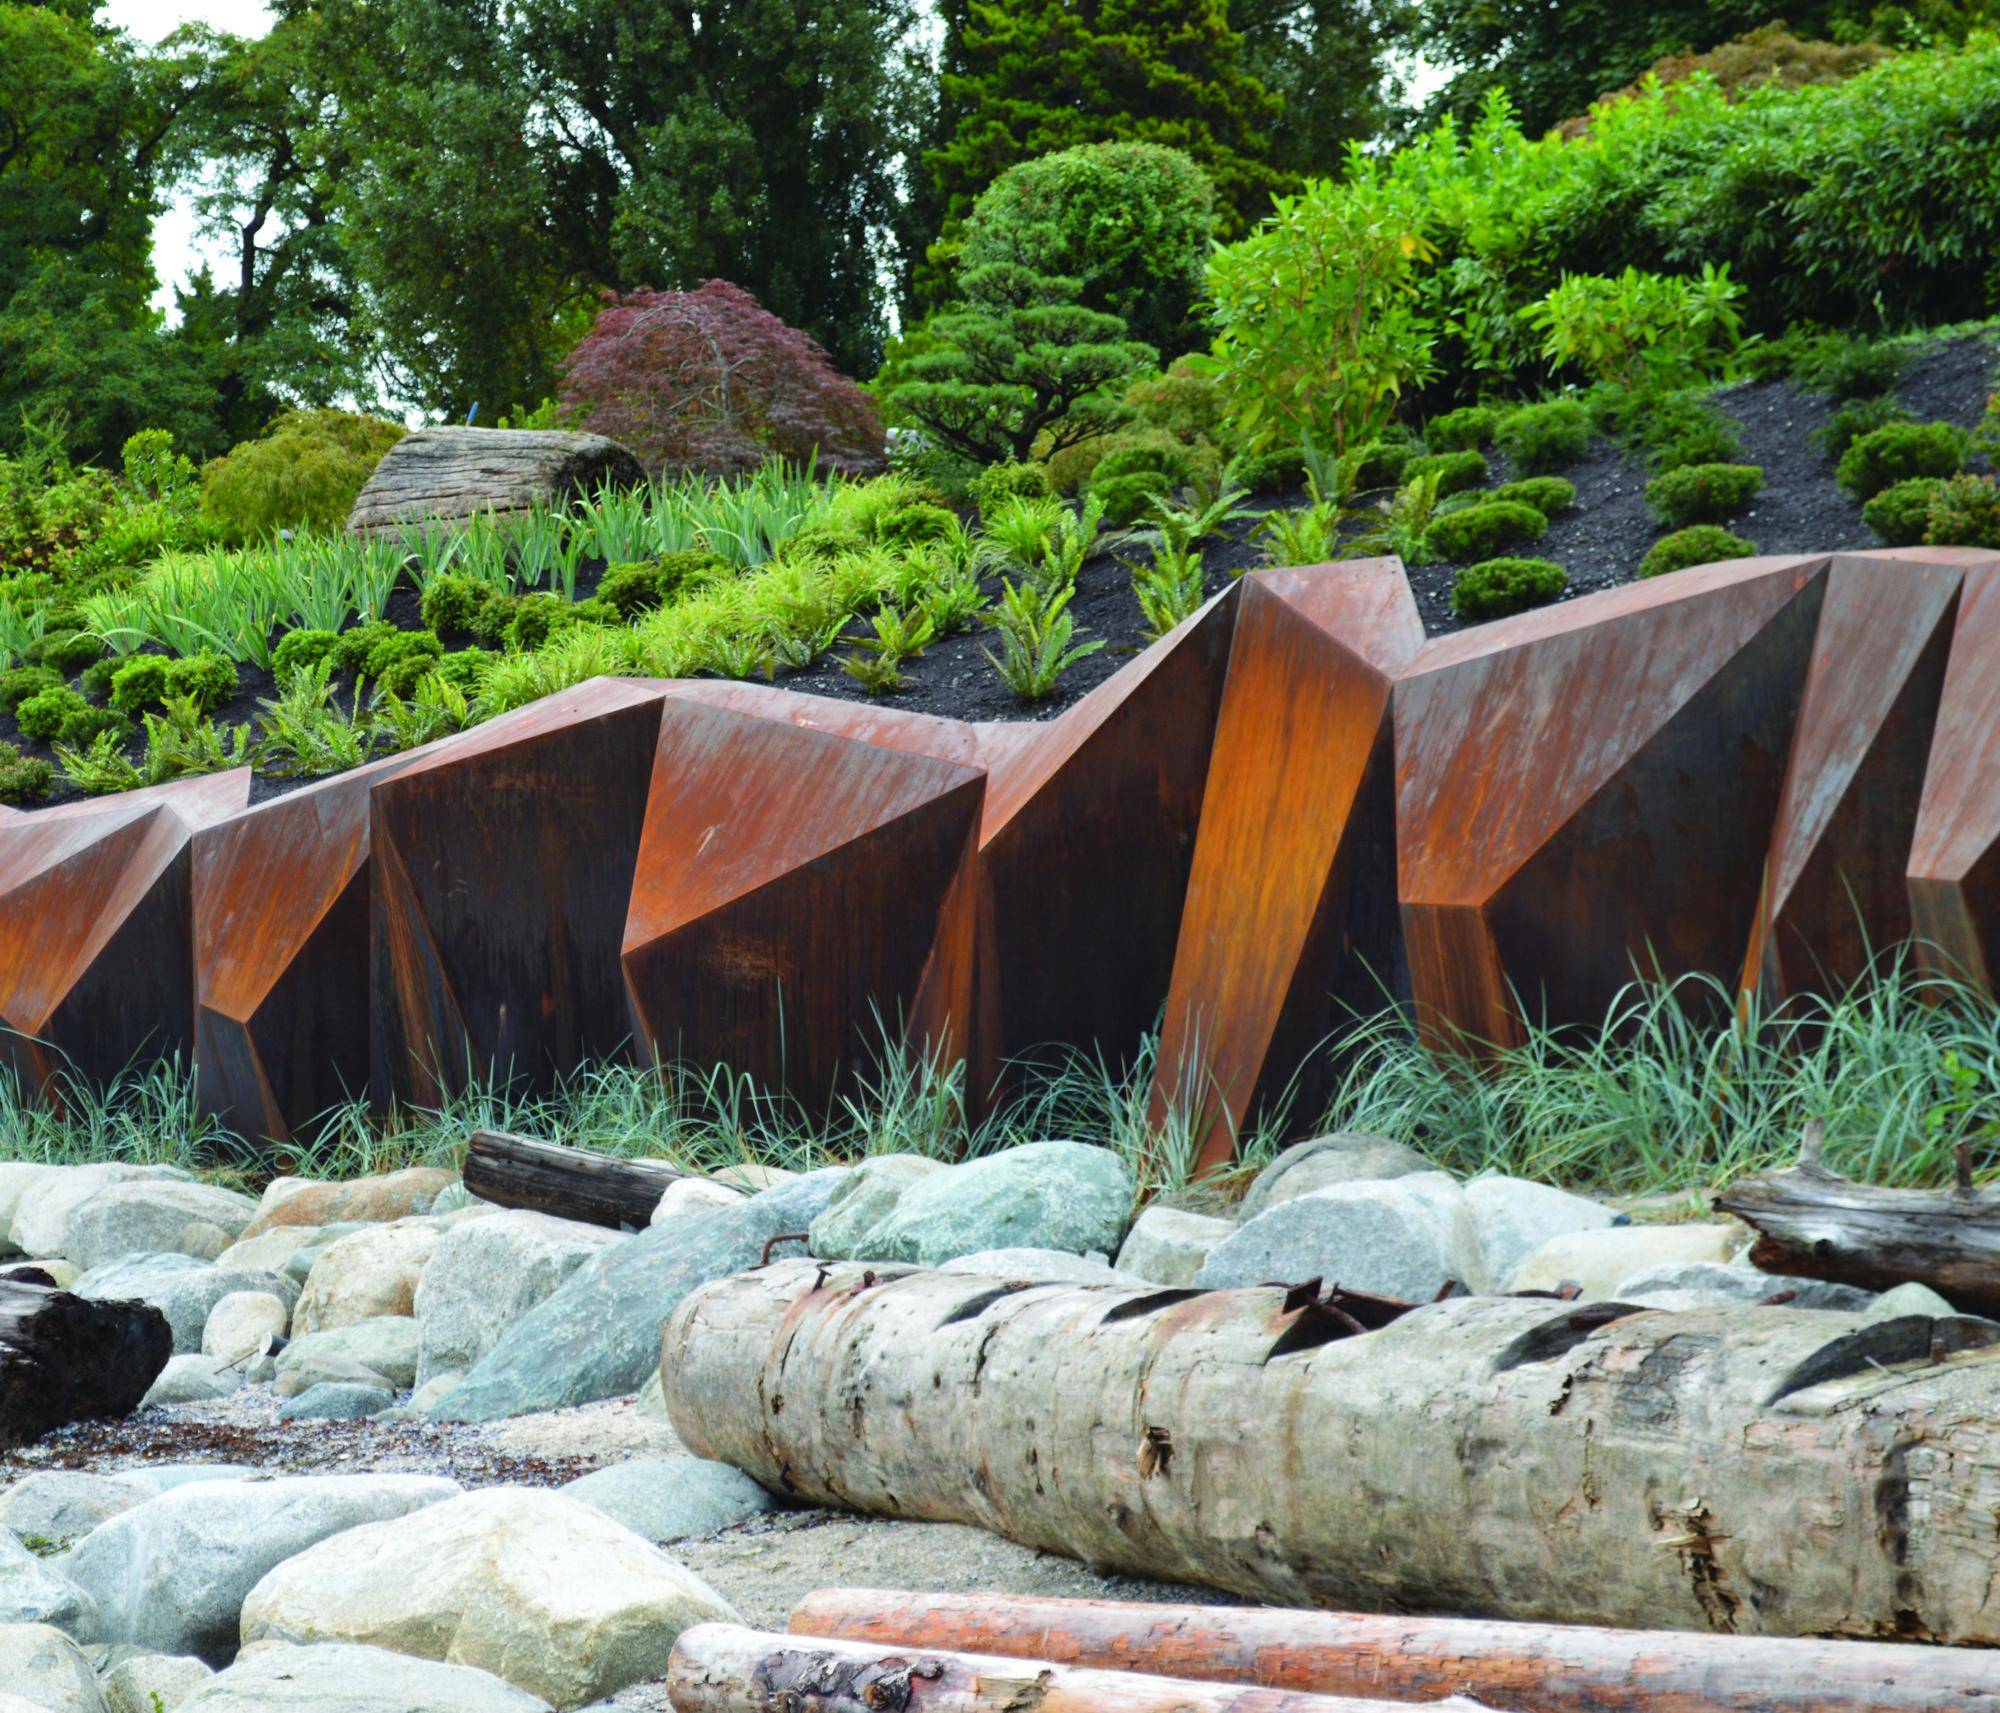 Paisaje y Arquitectura: Metamorphous, una escultura de acero cortén en medio del paisaje, Cortesia de Paul Sangha Landscape Architecture